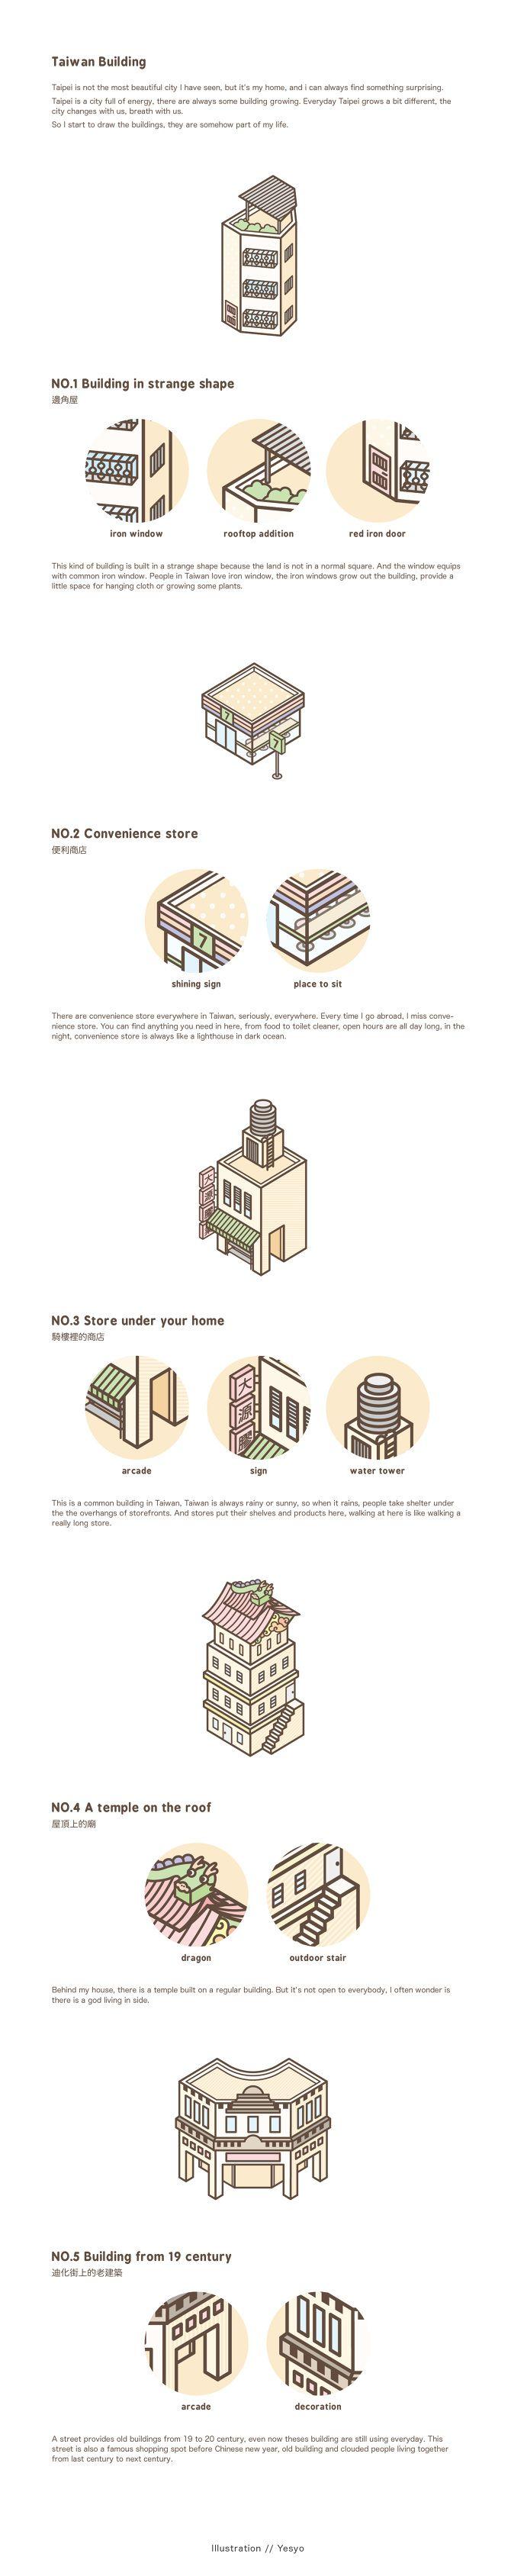 Taiwan Building - yesyoyeh